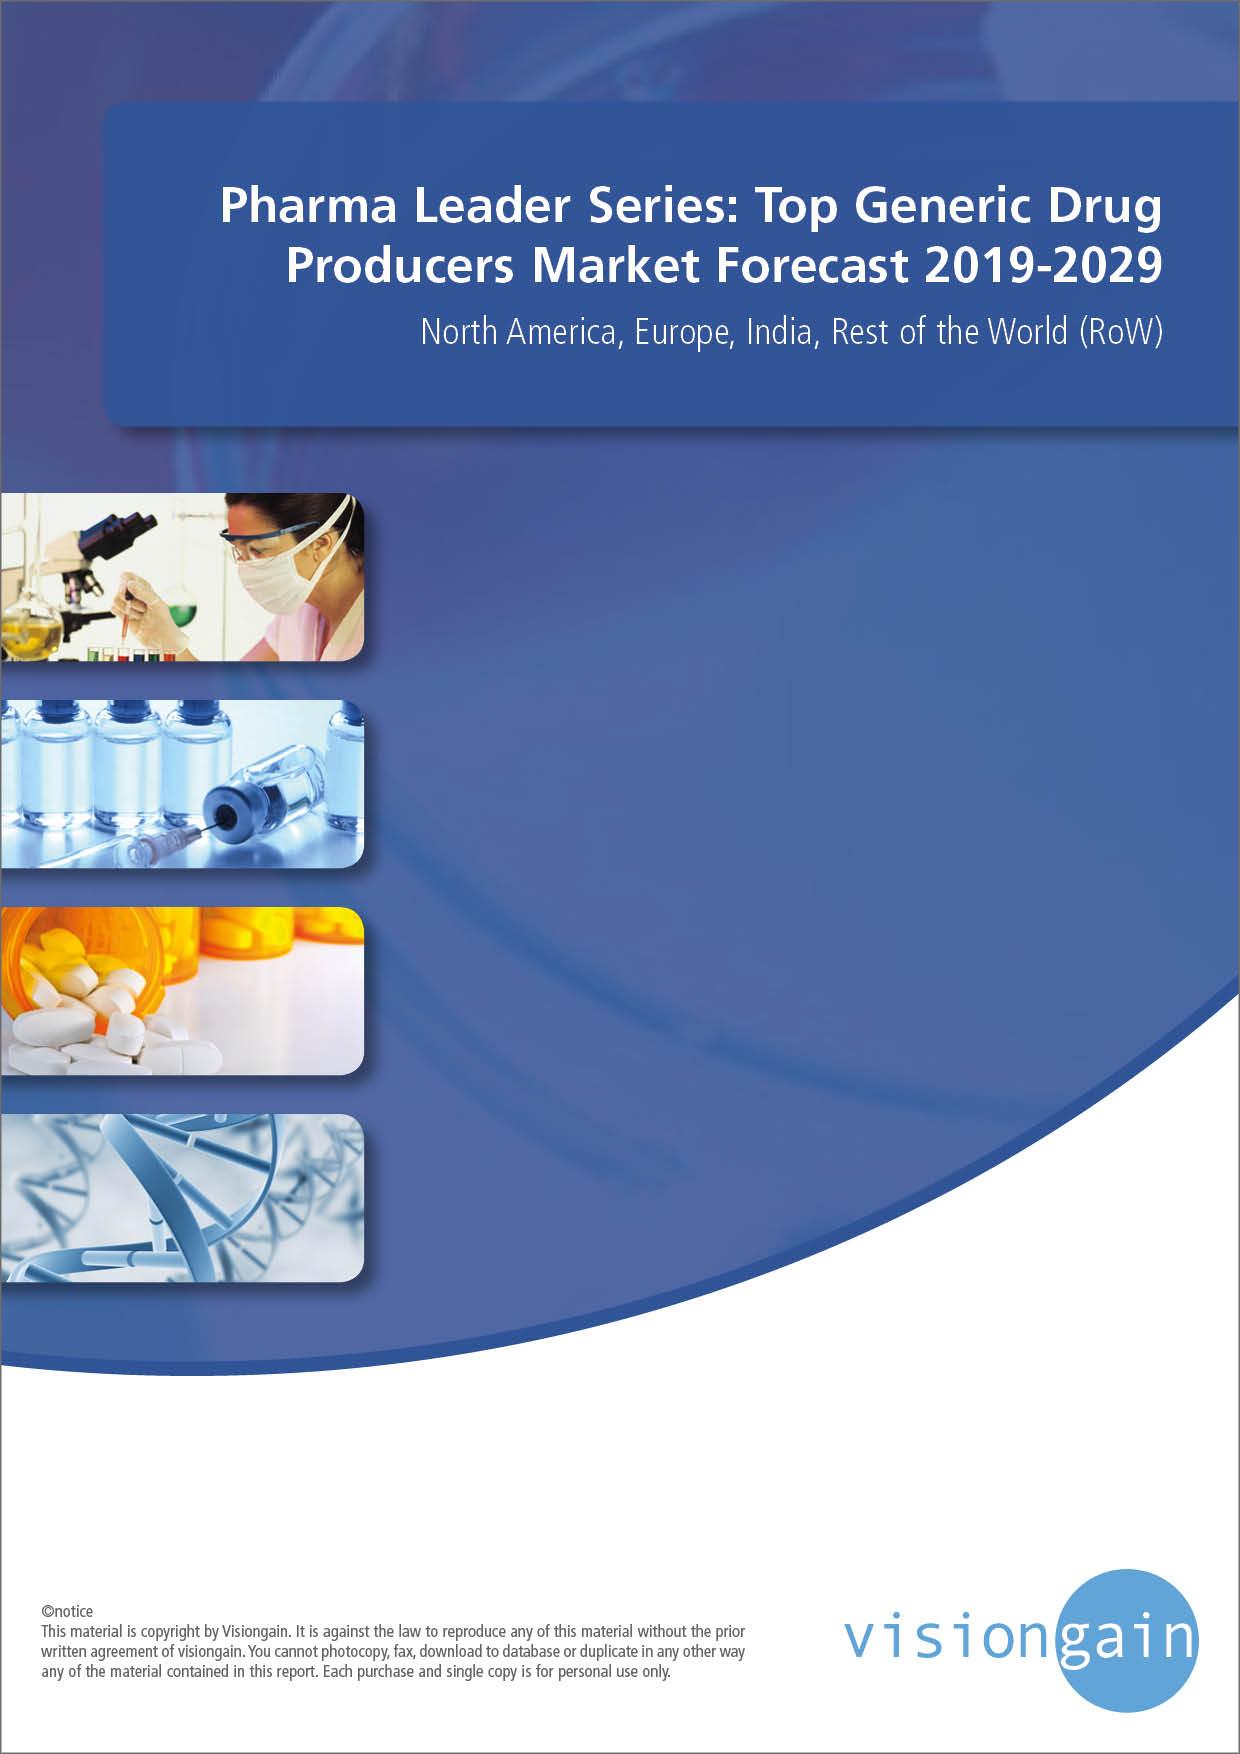 Pharma Leader Series: Top Generic Drug Producers Market Forecast 2019-2029